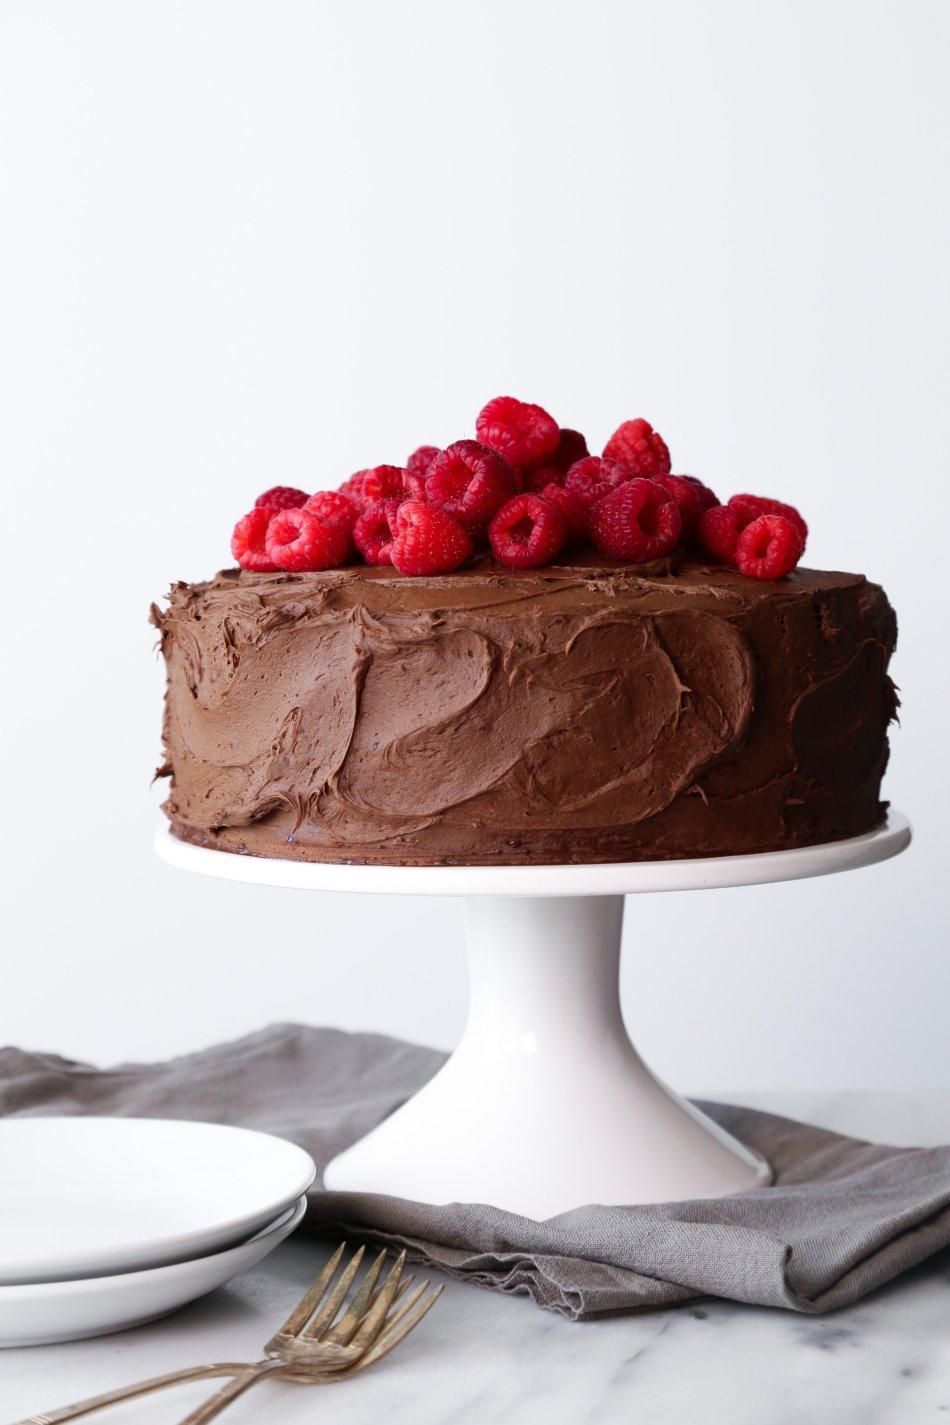 Chocolate Raspberry Layer CakeChocolate-Raspberry Layer Cake   Gluten & Dairy Free. Vegan Friendly.